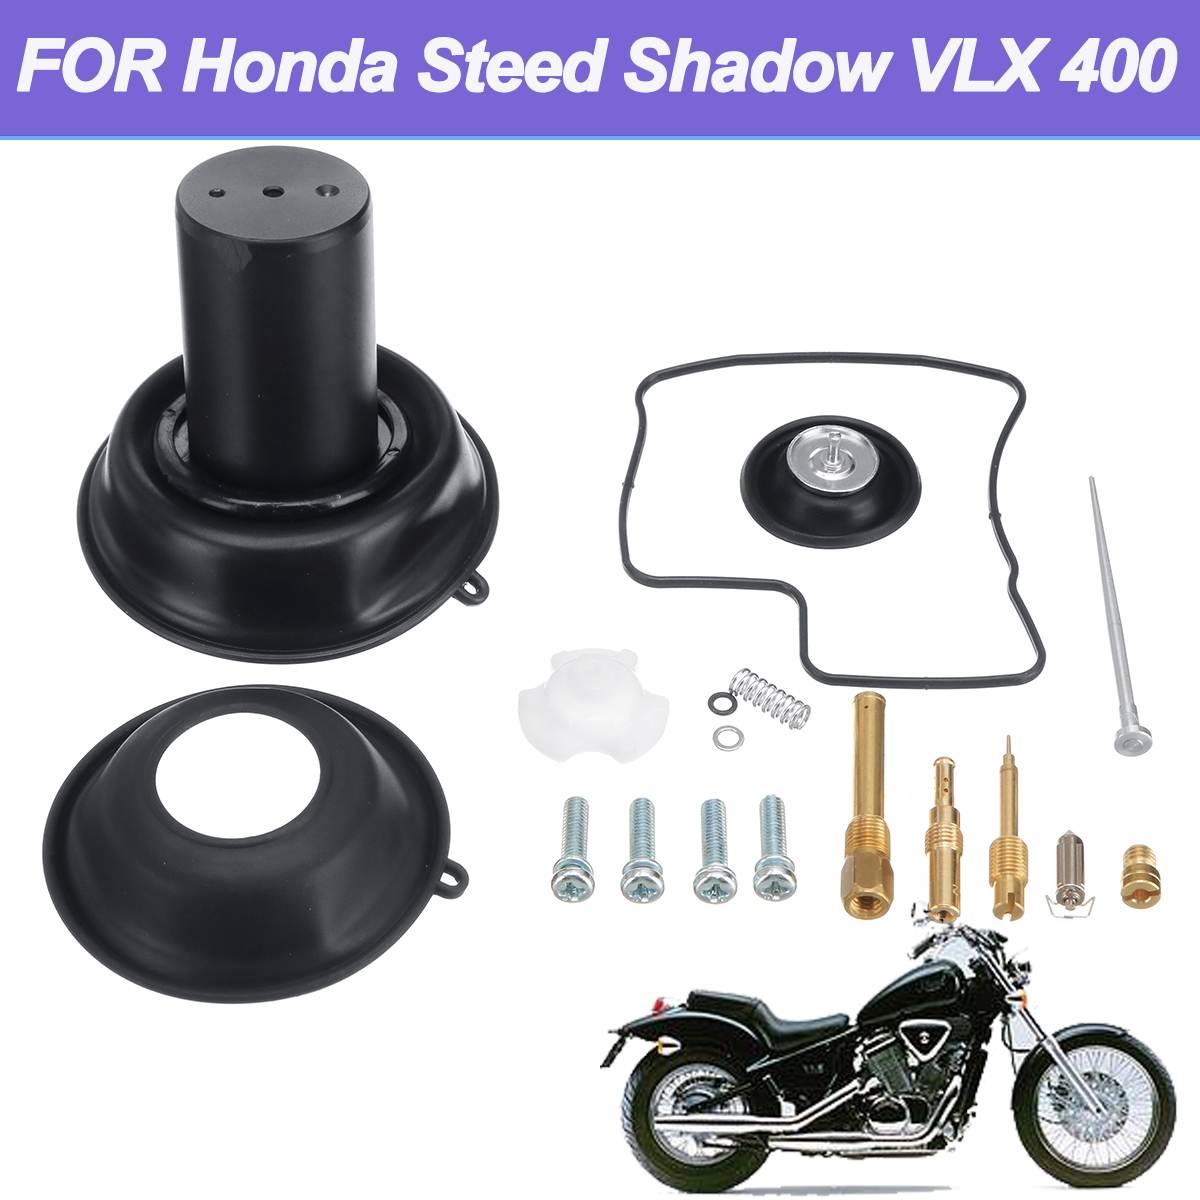 Vacuum Diaphragm Plunger Kit Carburetor Diaphragm plunger w/Needle Carburetor Repair Kit for Honda Steed Shadow VLX 400